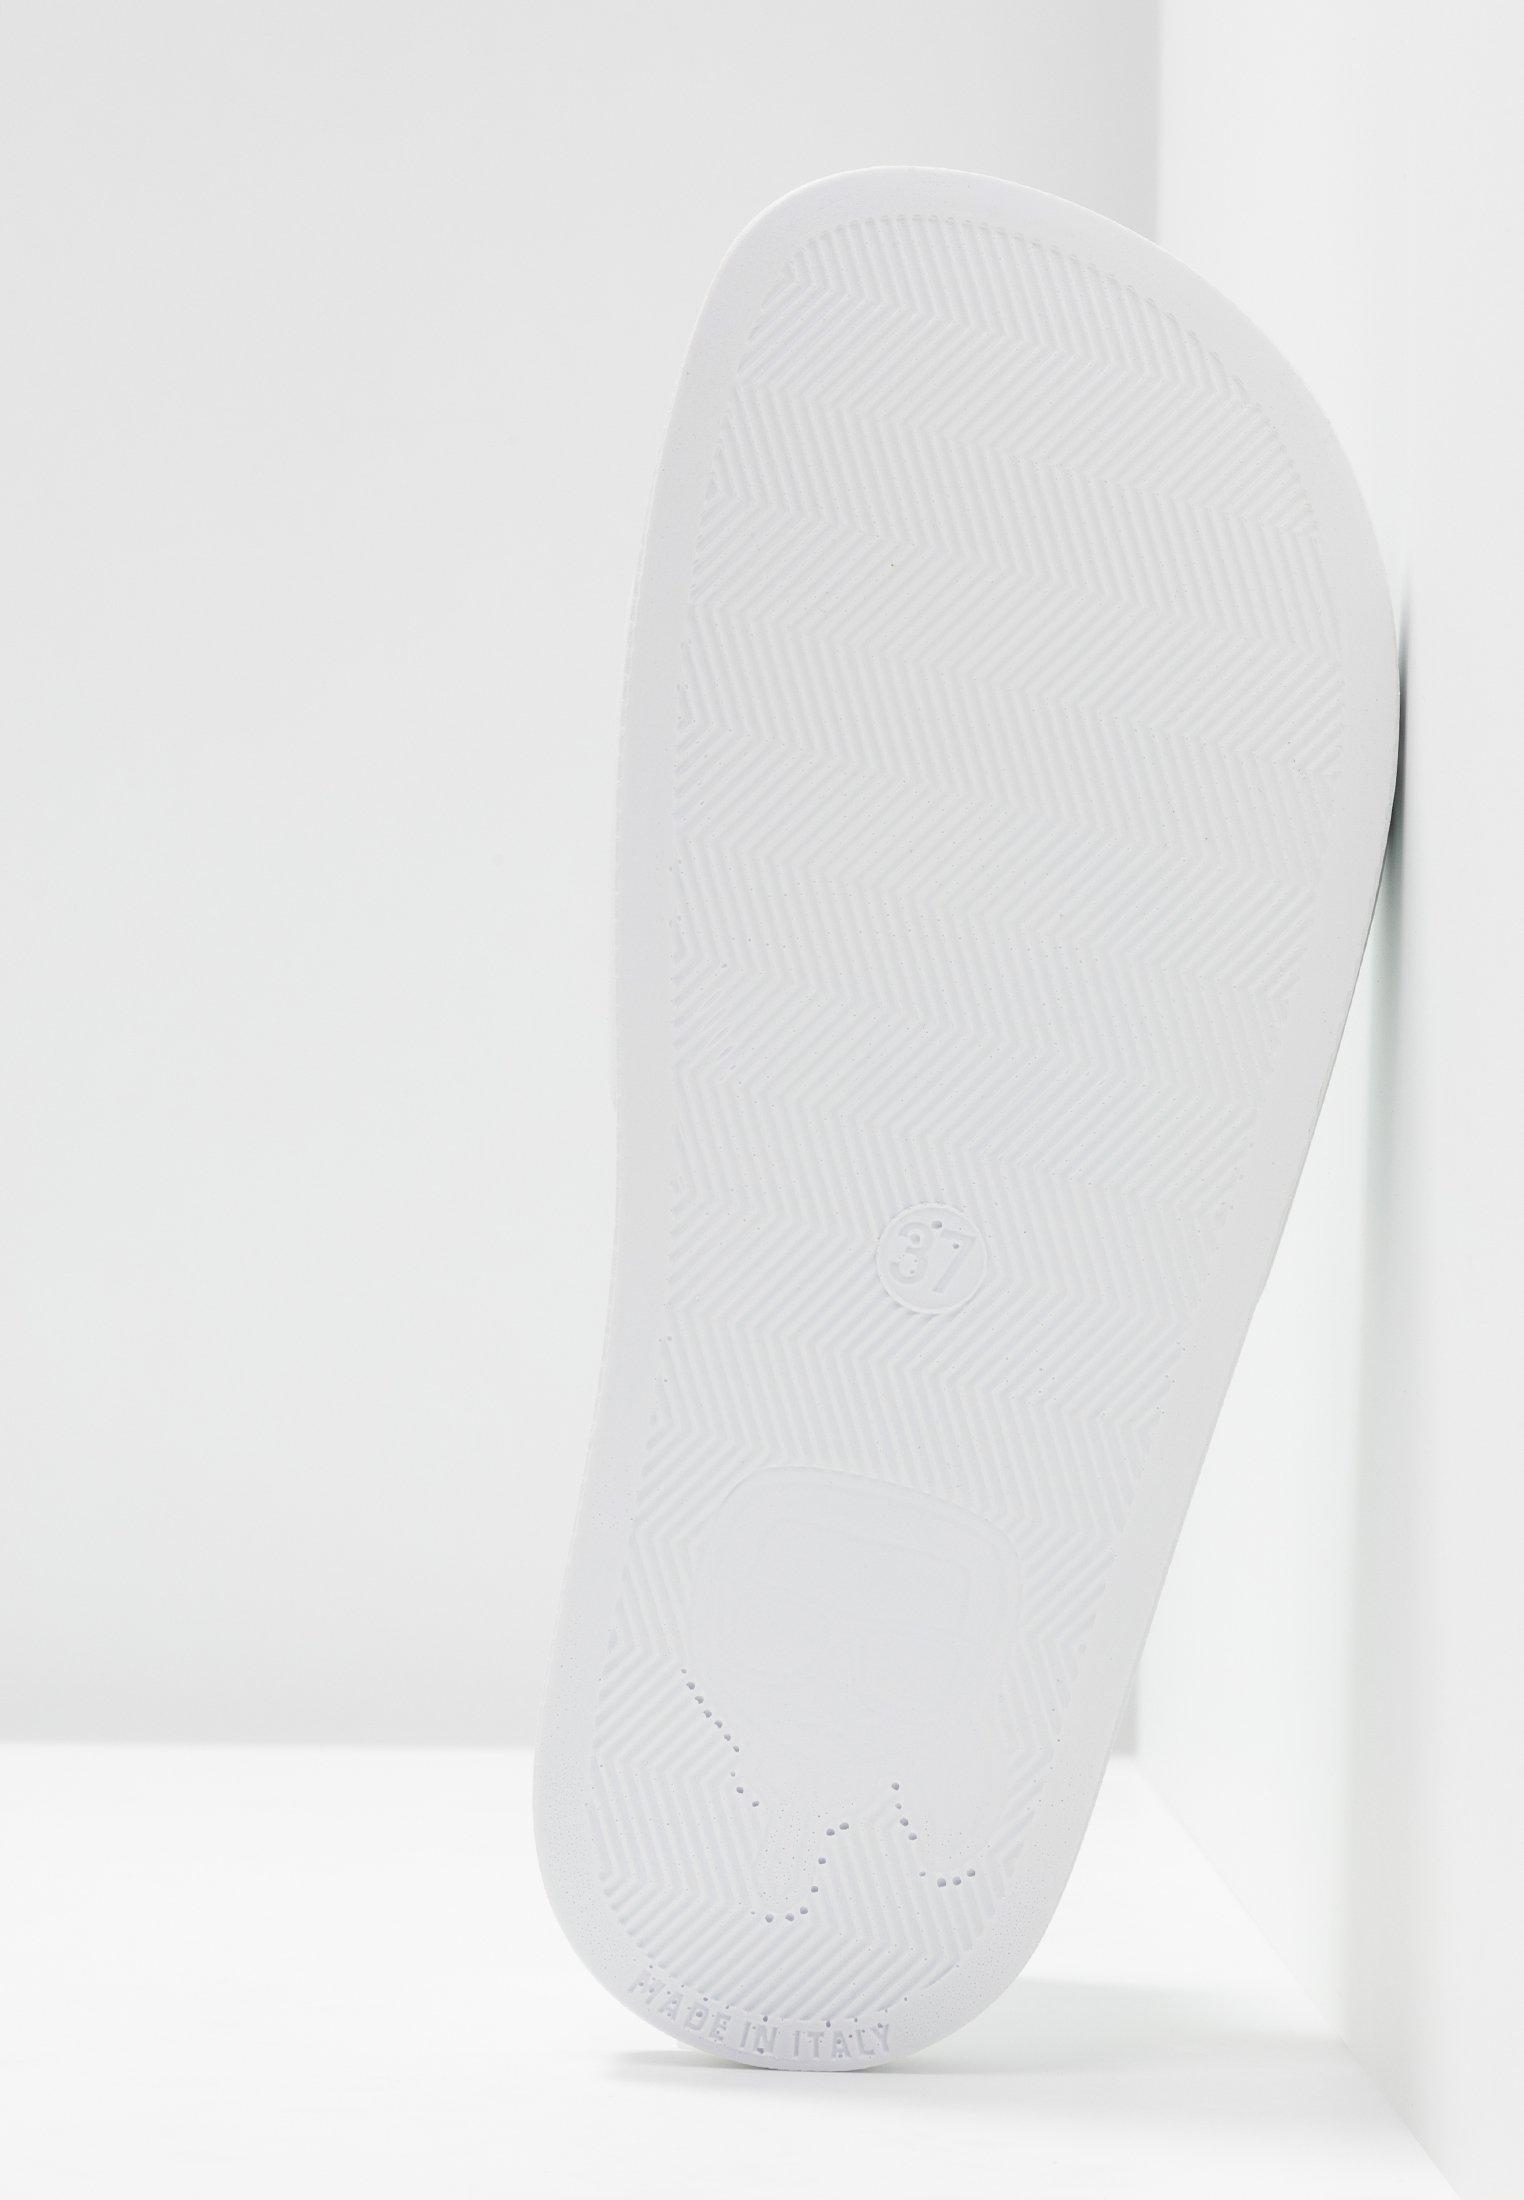 KARL LAGERFELD KONDO IKONIC SLIDE - Klapki - white